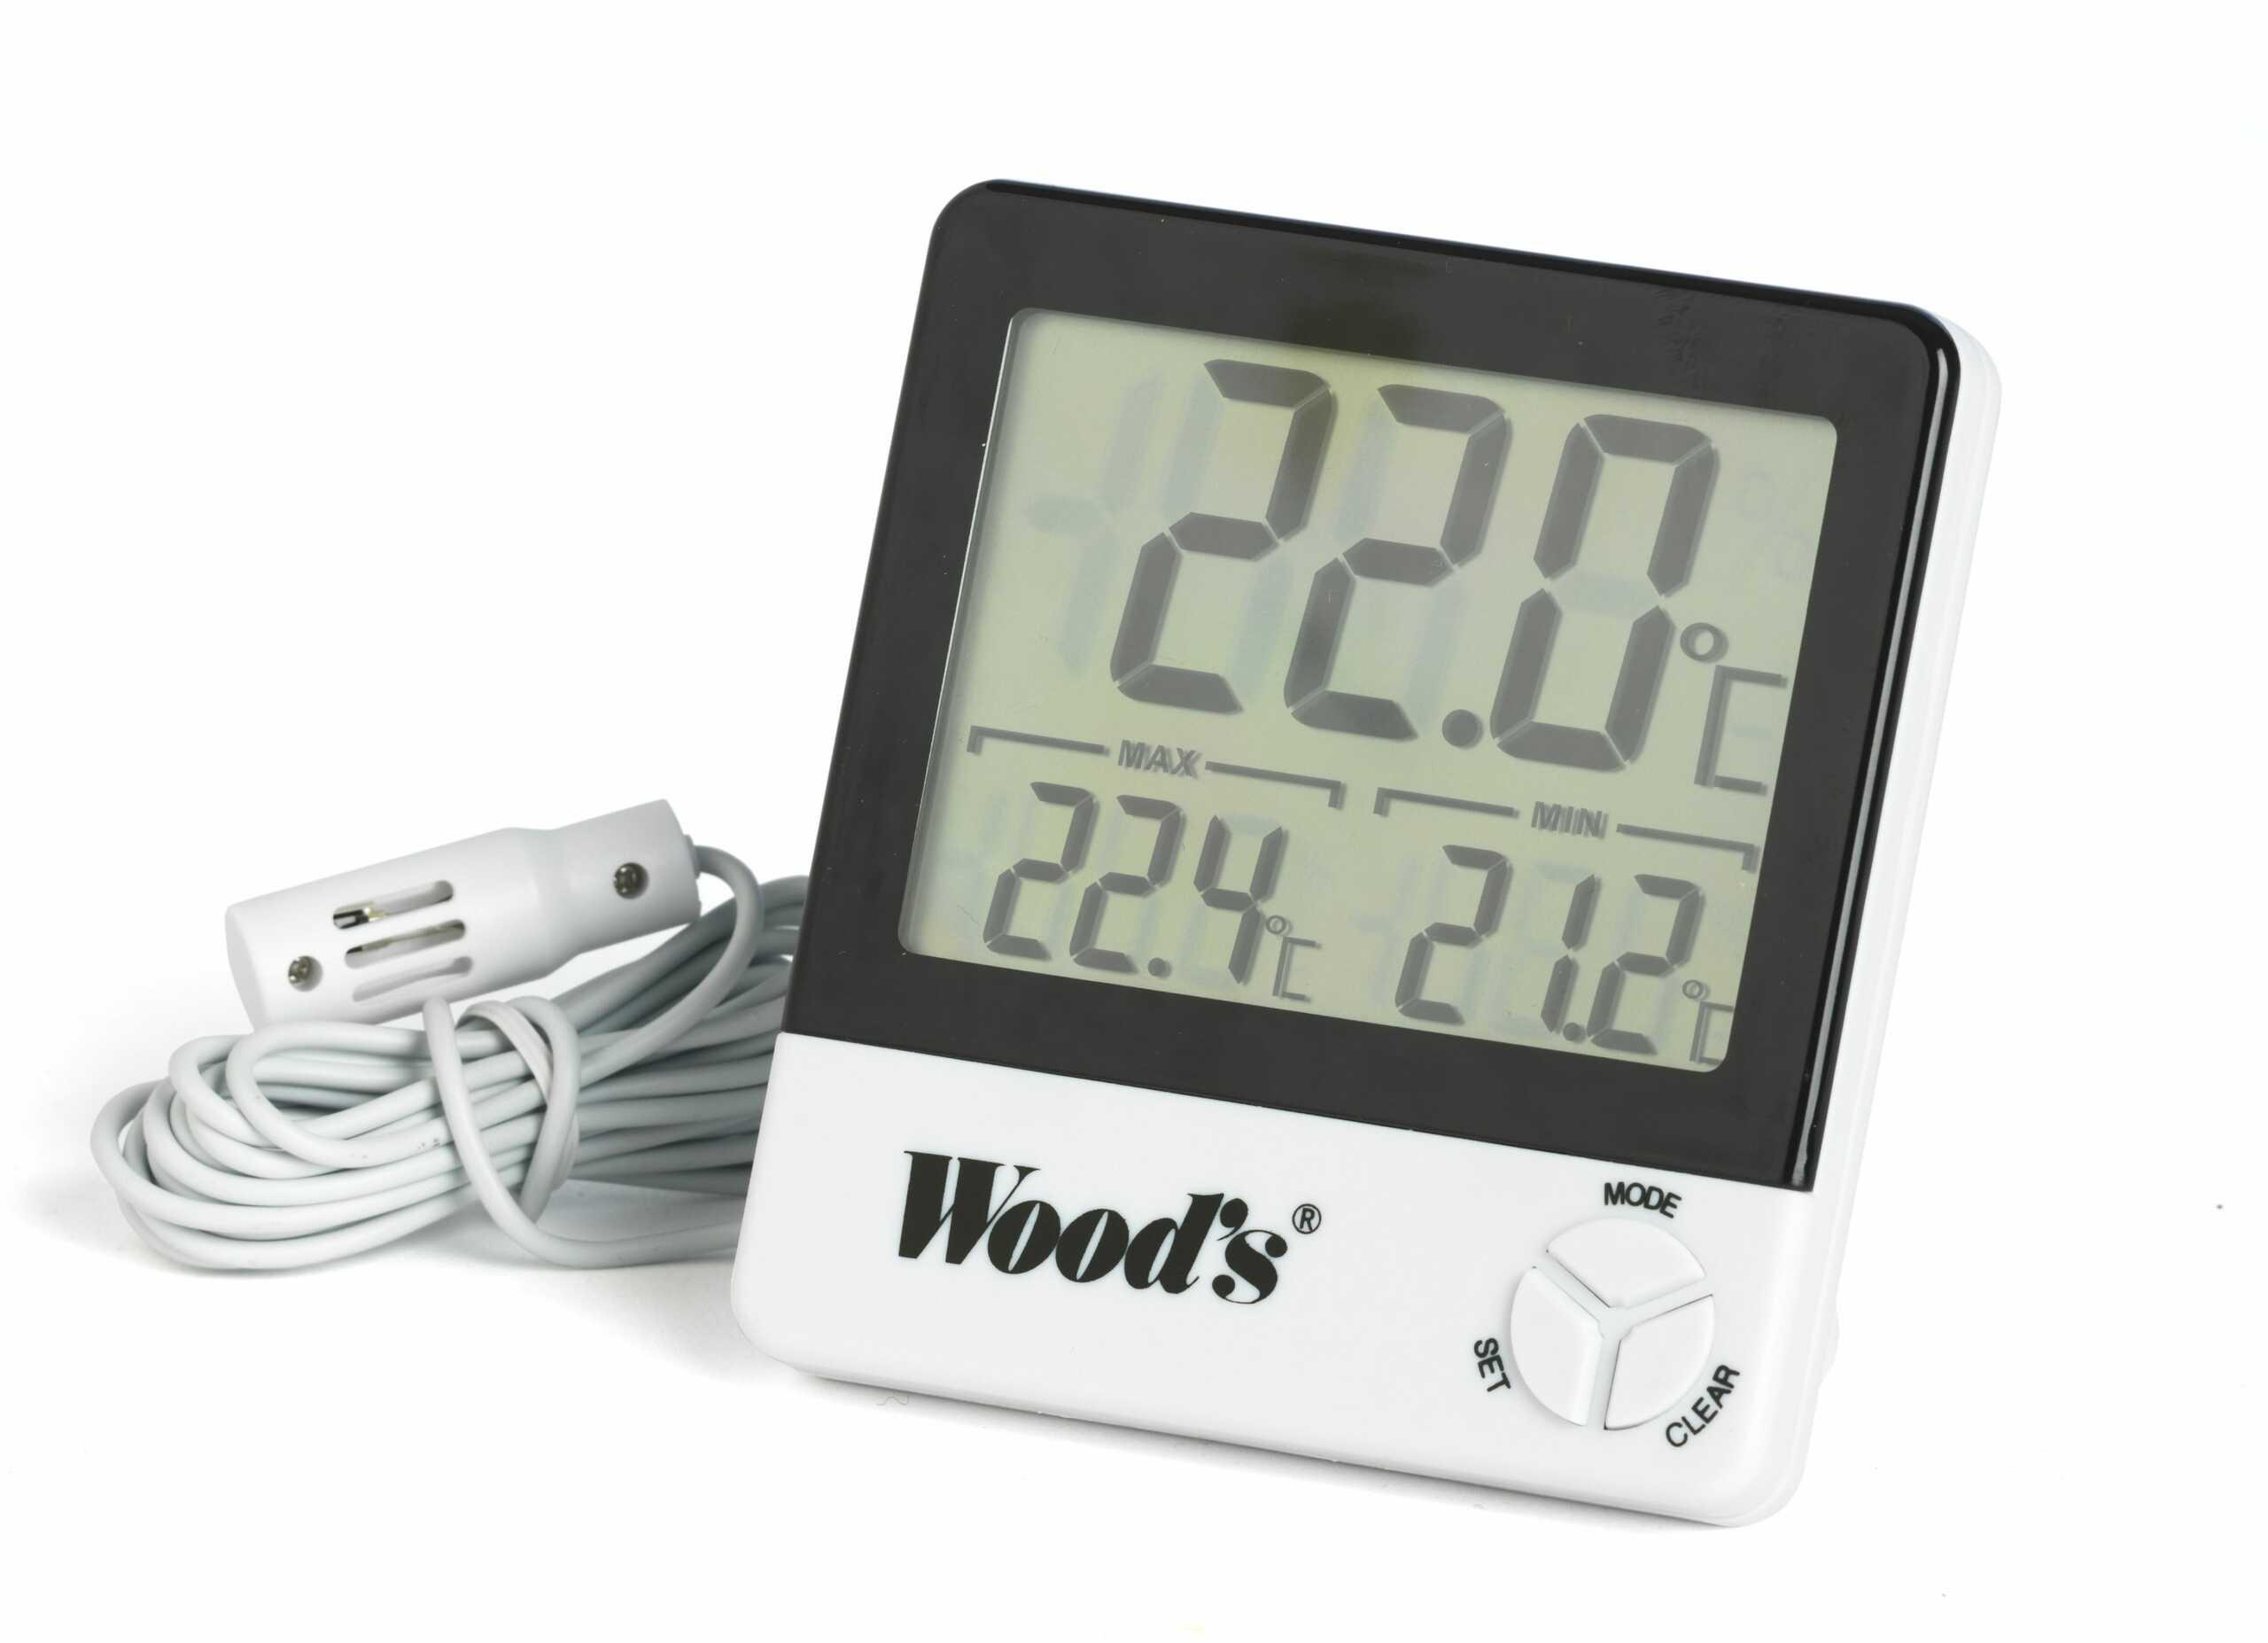 Wood''s Higrometr SS7002